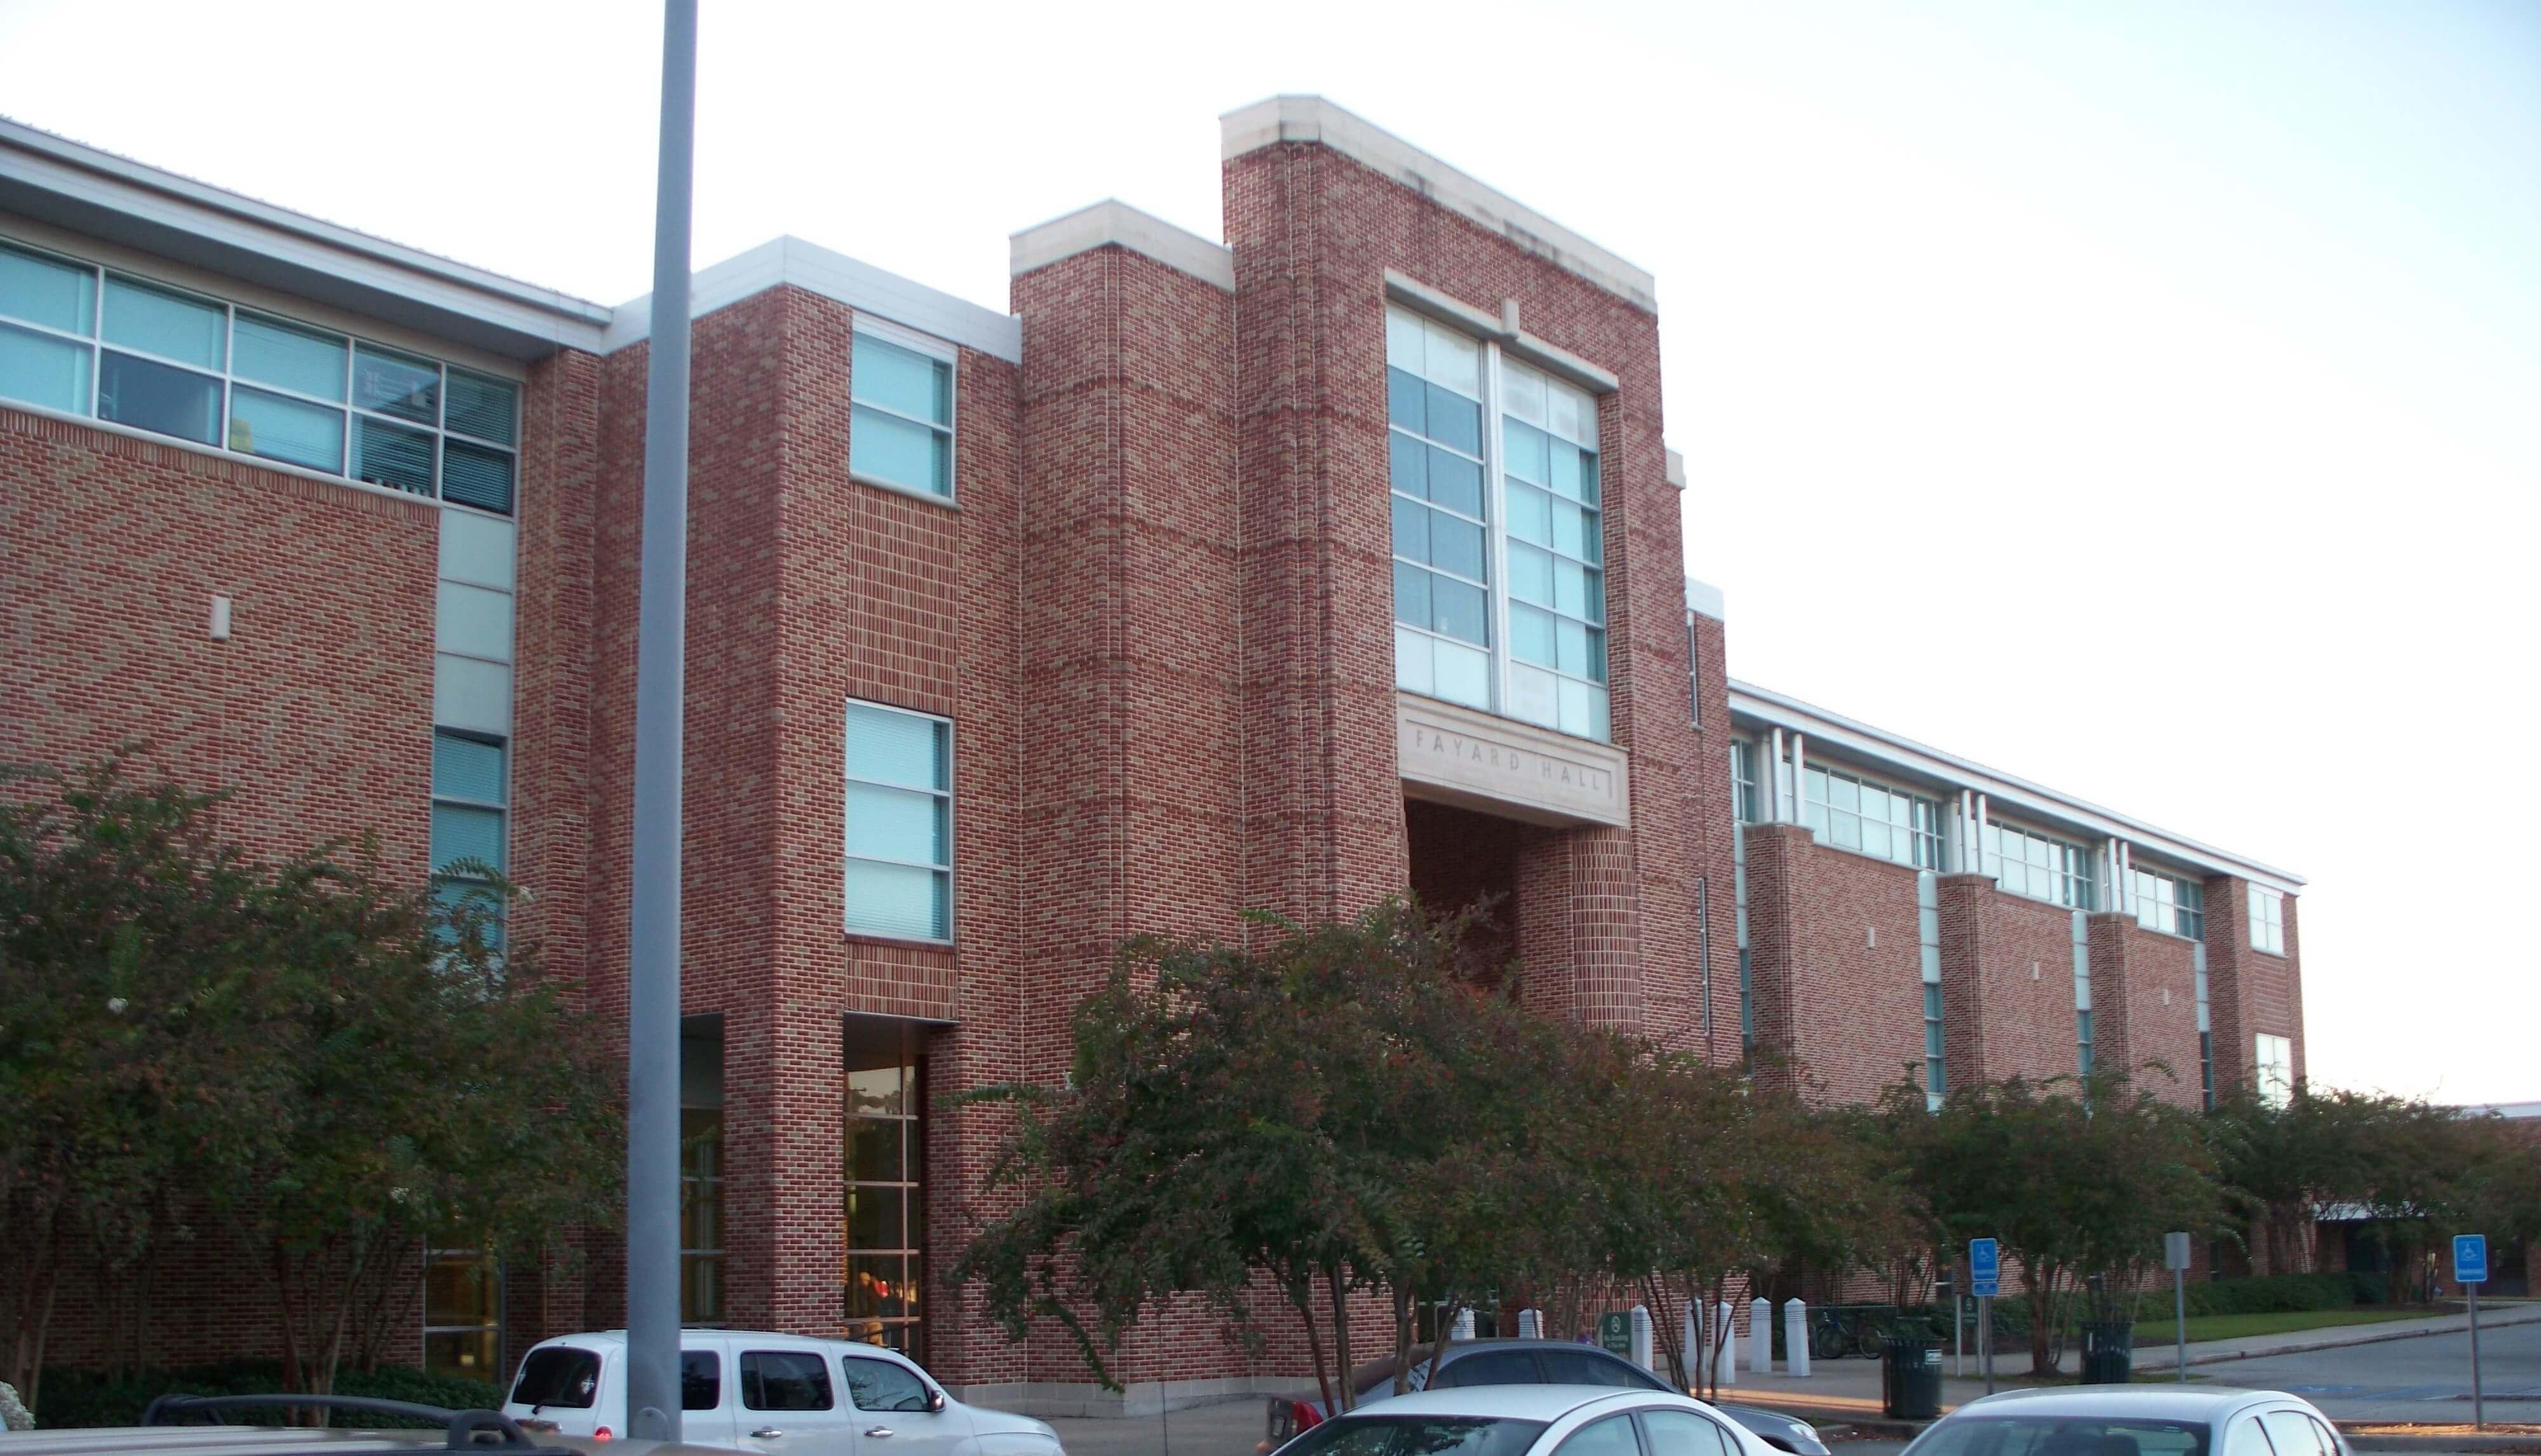 southeasteern university